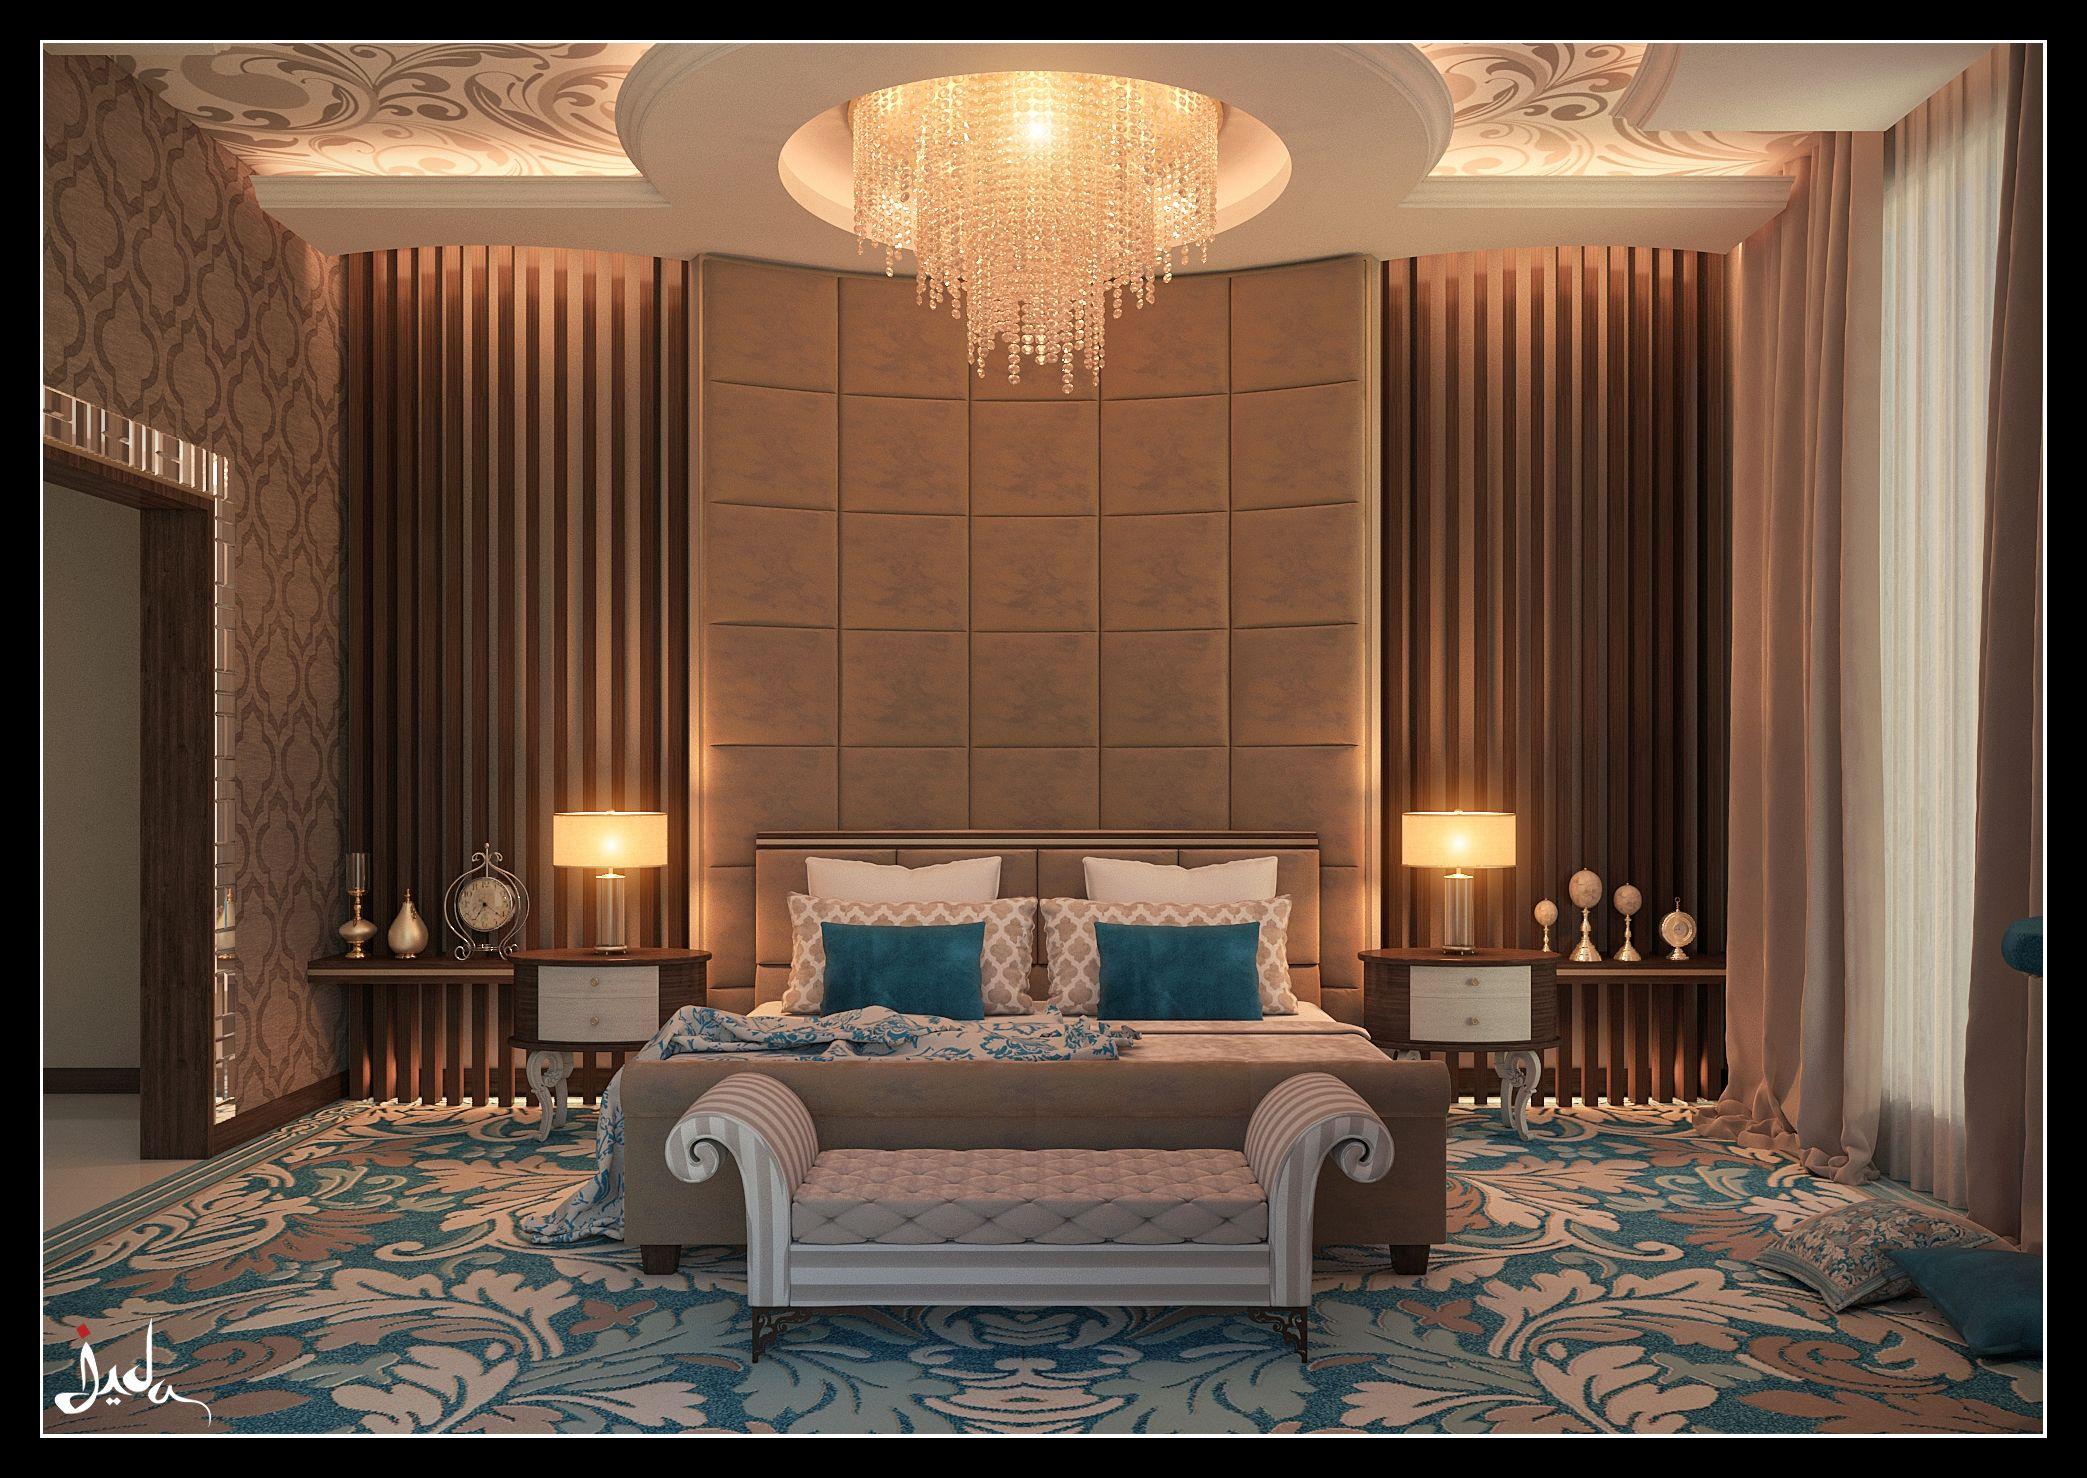 Elegant Luxury Interior Design By Jida For More Designs Contact Us On 920006386 Interior Design Luxury Interior Design Luxury Interior